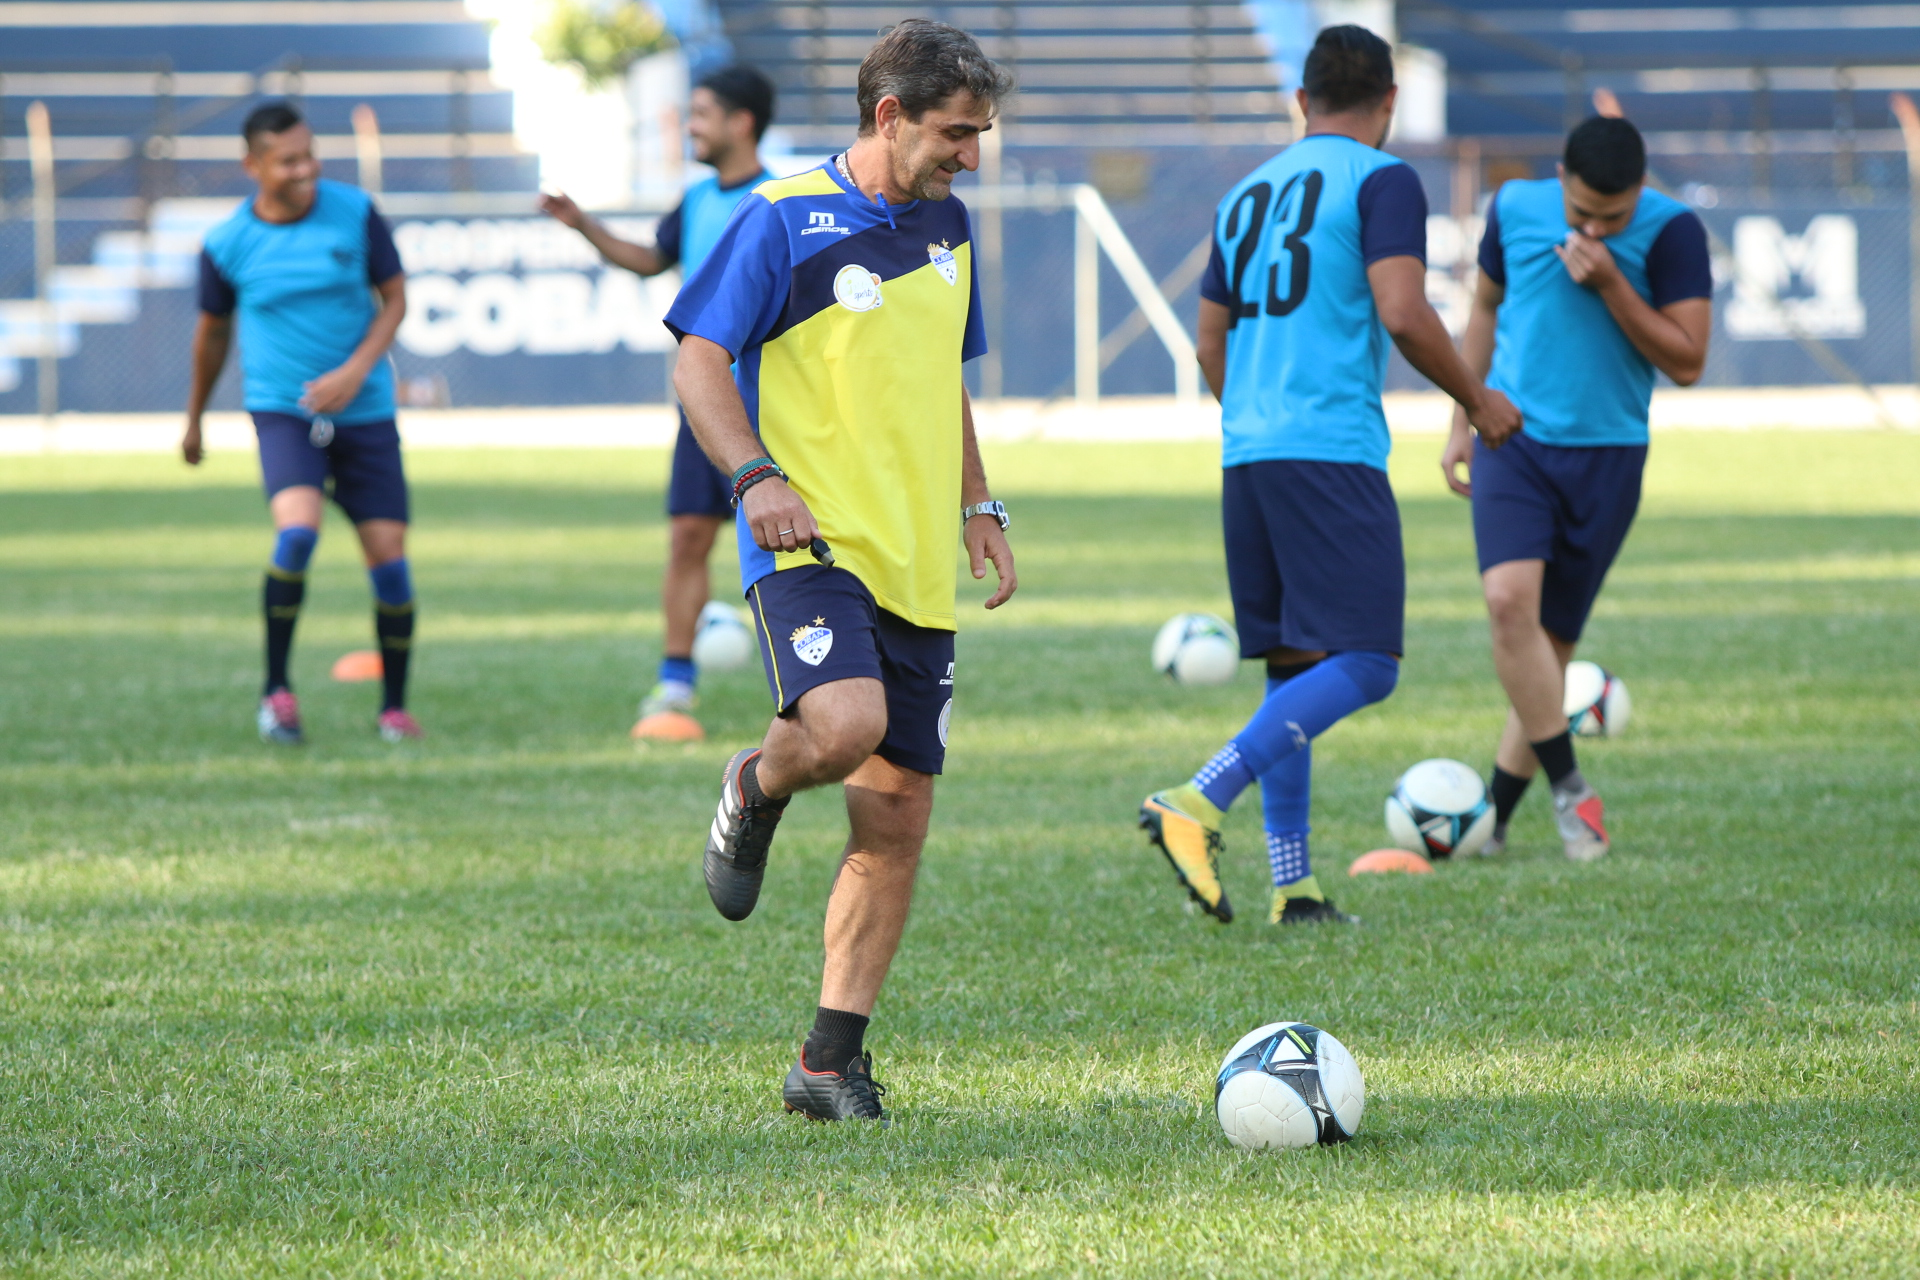 El entrenador Fabricio Benítez prepara su equipo para enfrentar a Iztapa. (Foto Prensa Libre: Eduardo Sam Chun)